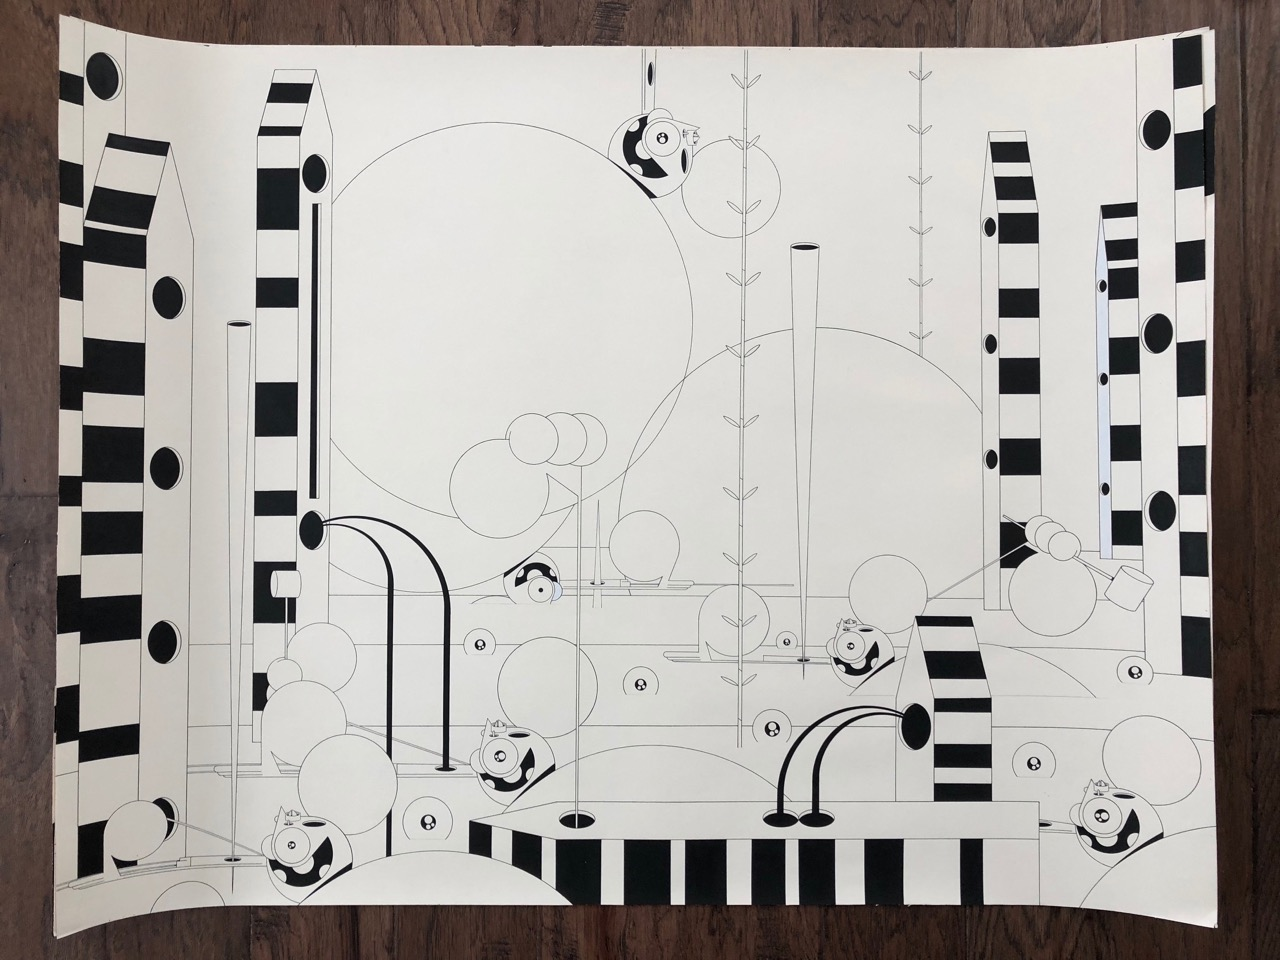 Dalek_Large-Drawing-3-30x40